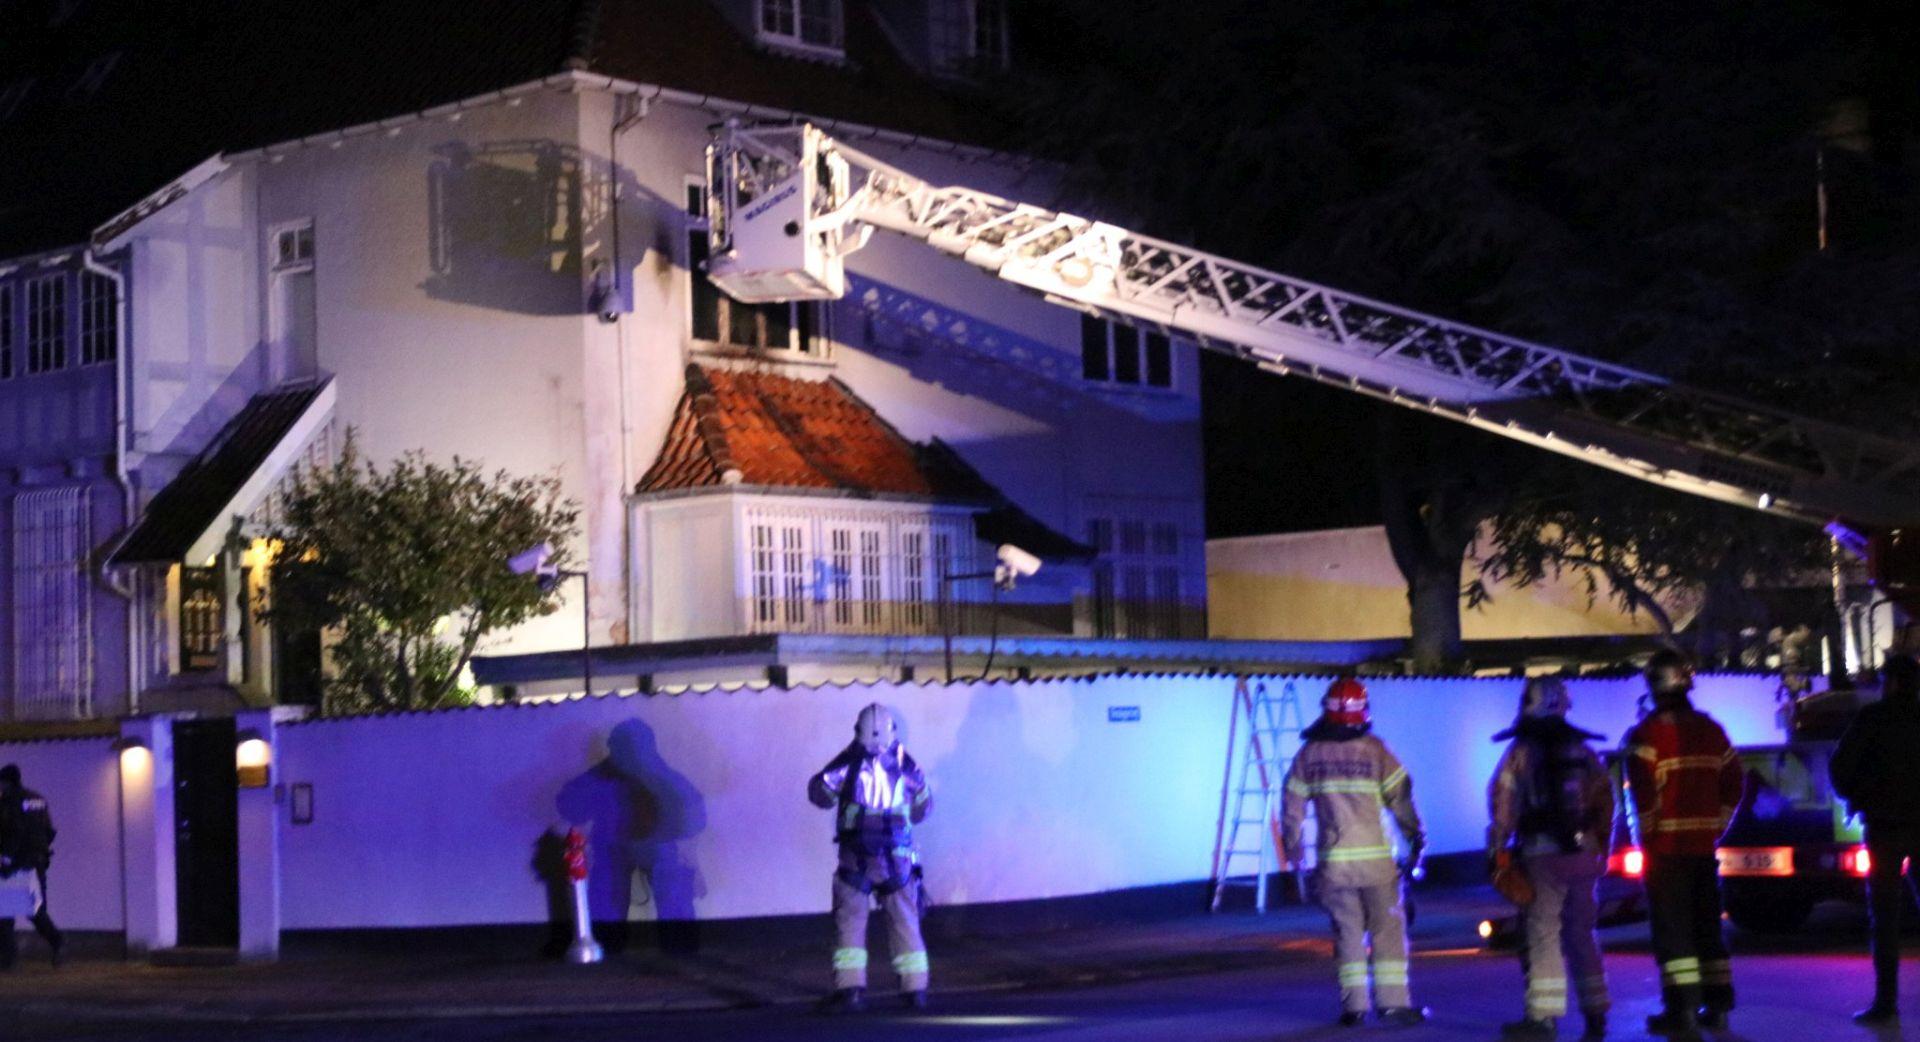 Napadnuto tursko veleposlanstvo u Danskoj